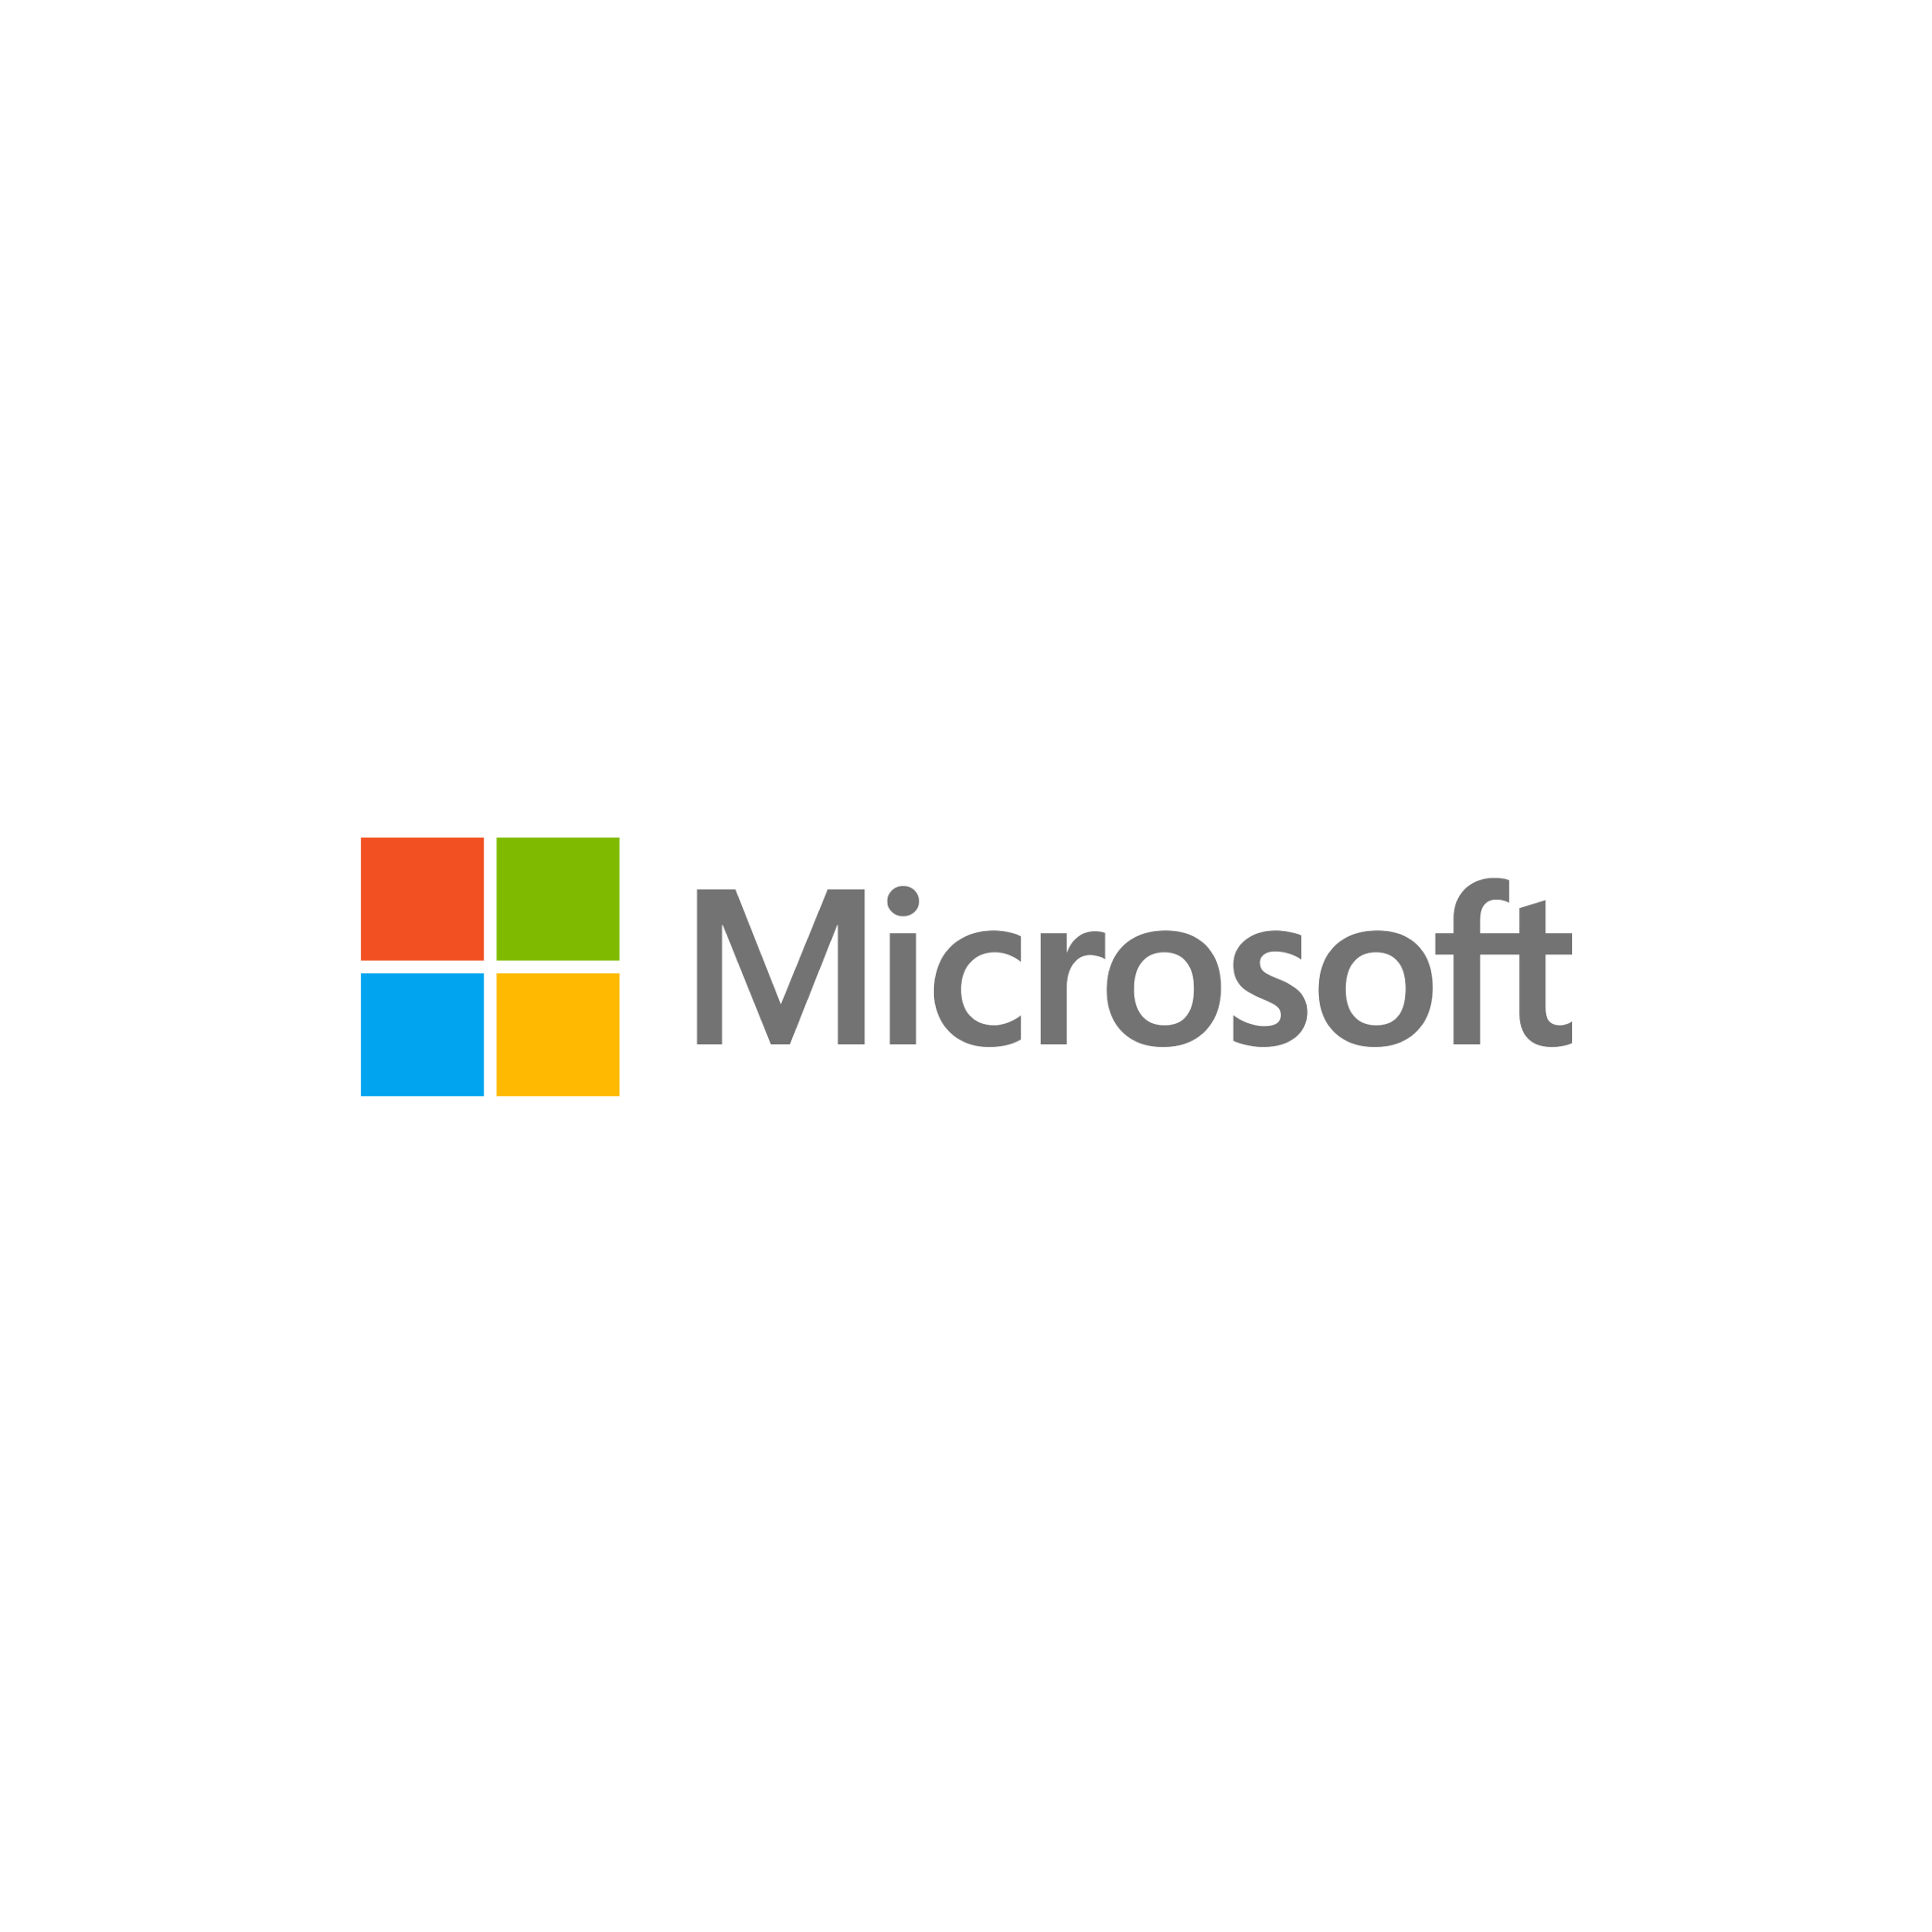 logo-MS-500x500-01.png